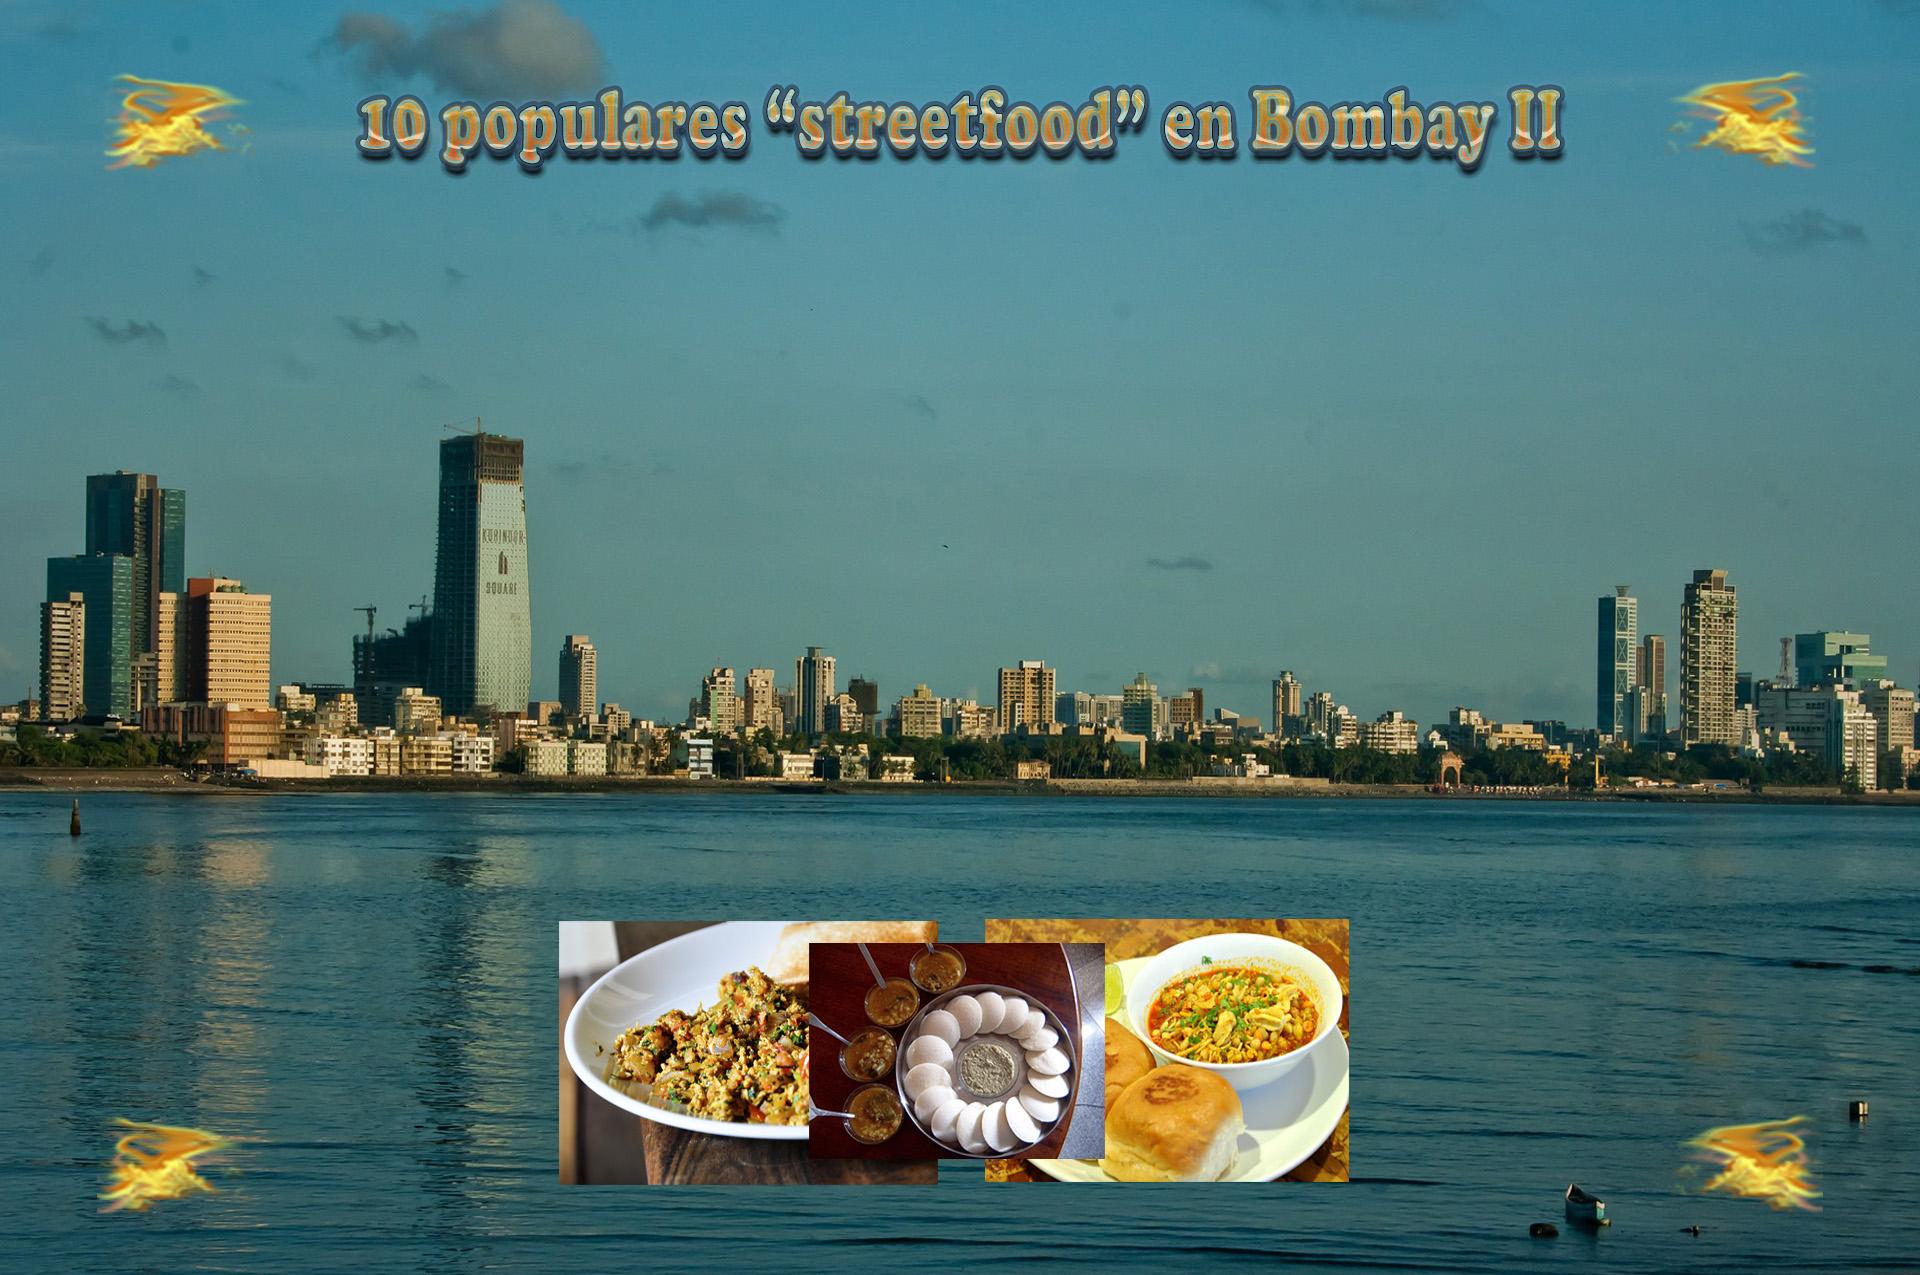 10 populares streetfood en Bombay II